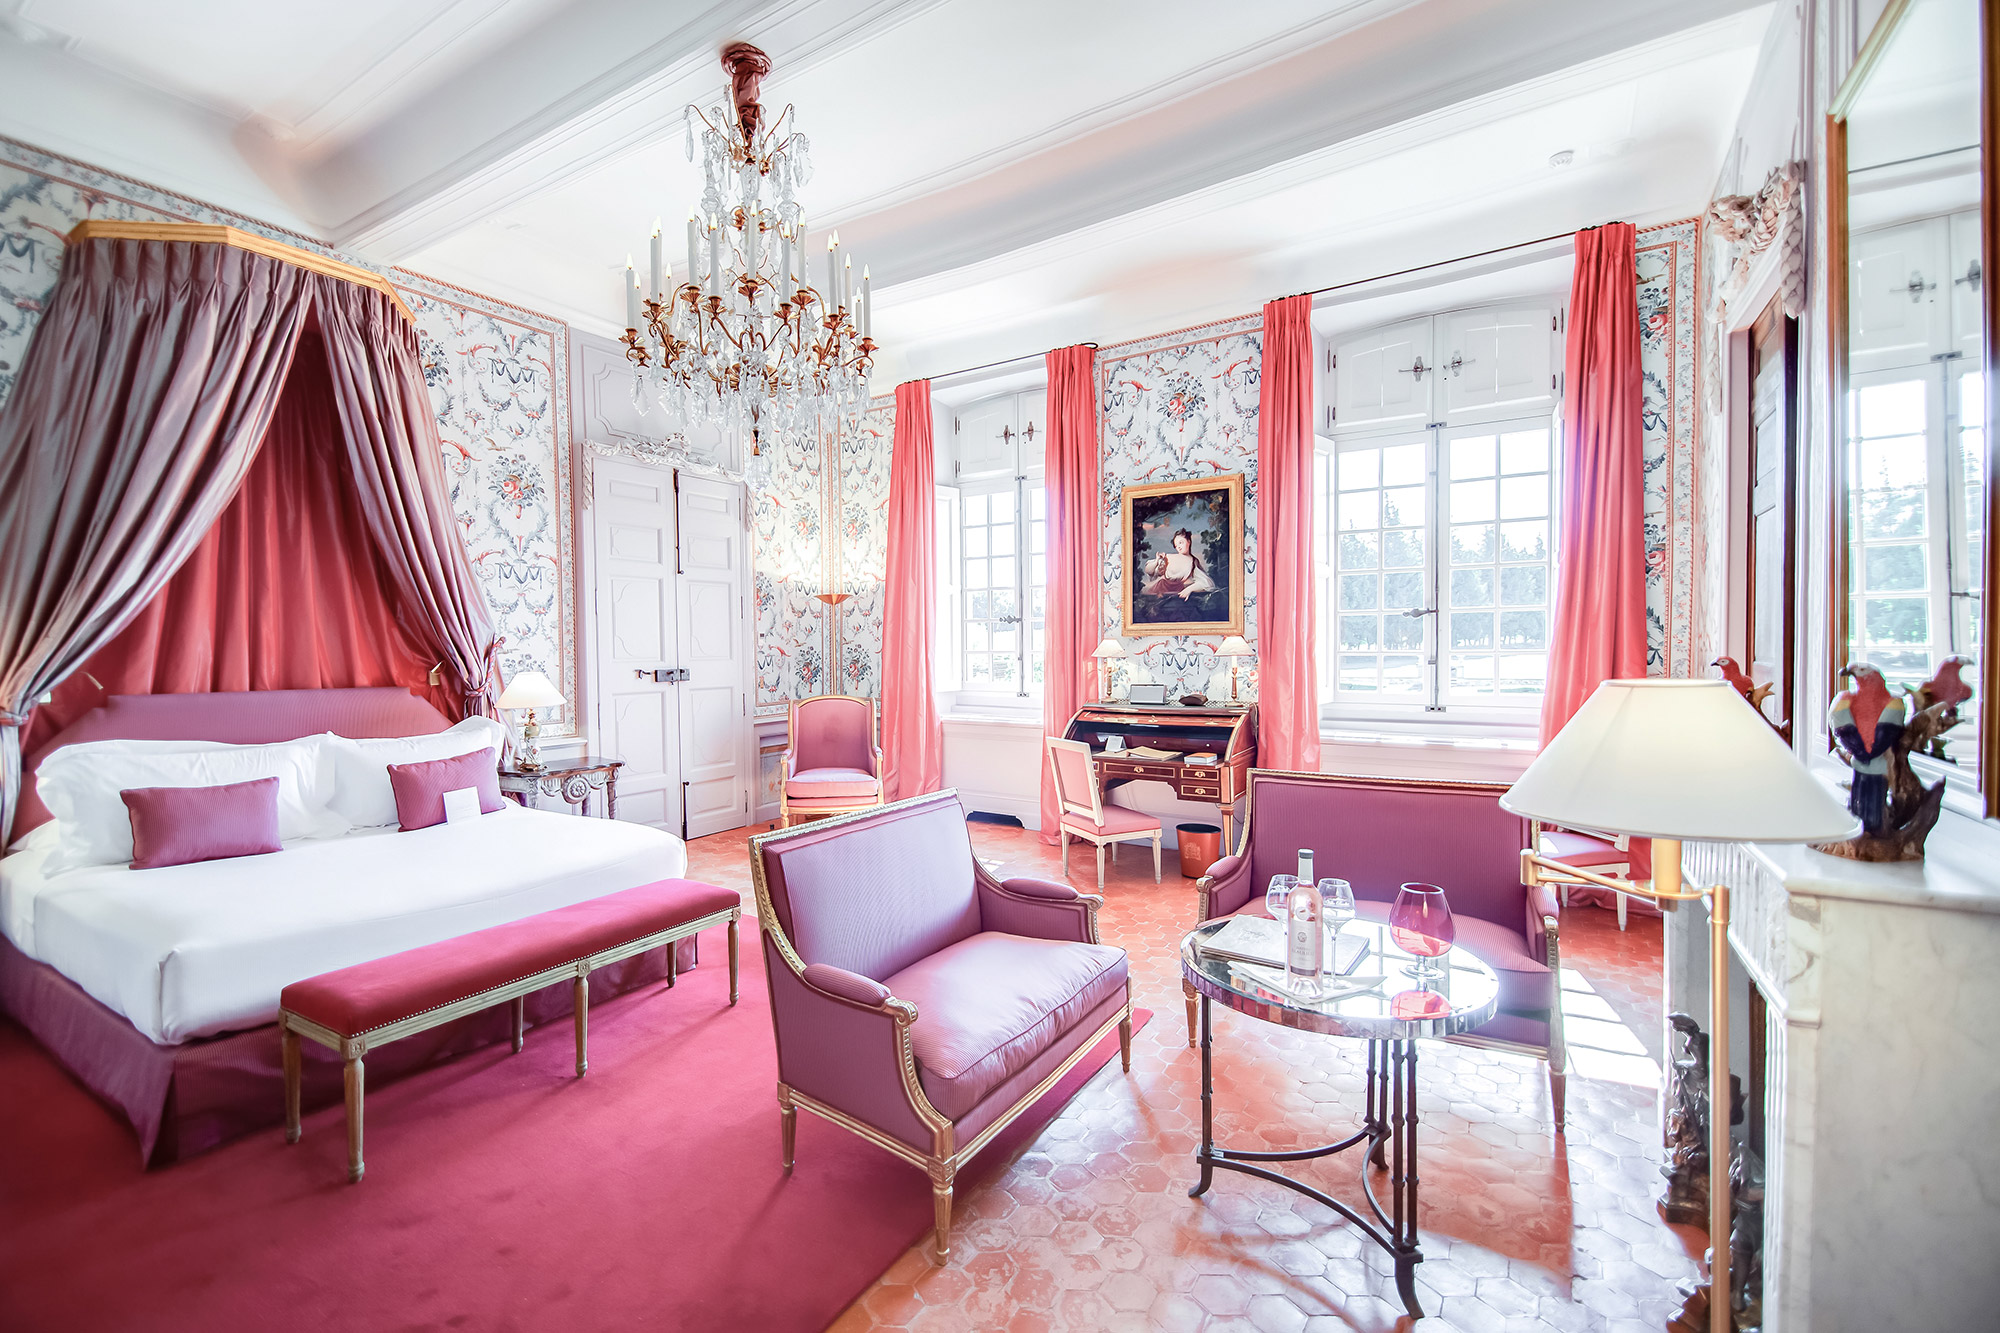 Chambre avec ciel de lit et lit à baldaquin à la Villa Baulieu en Provence